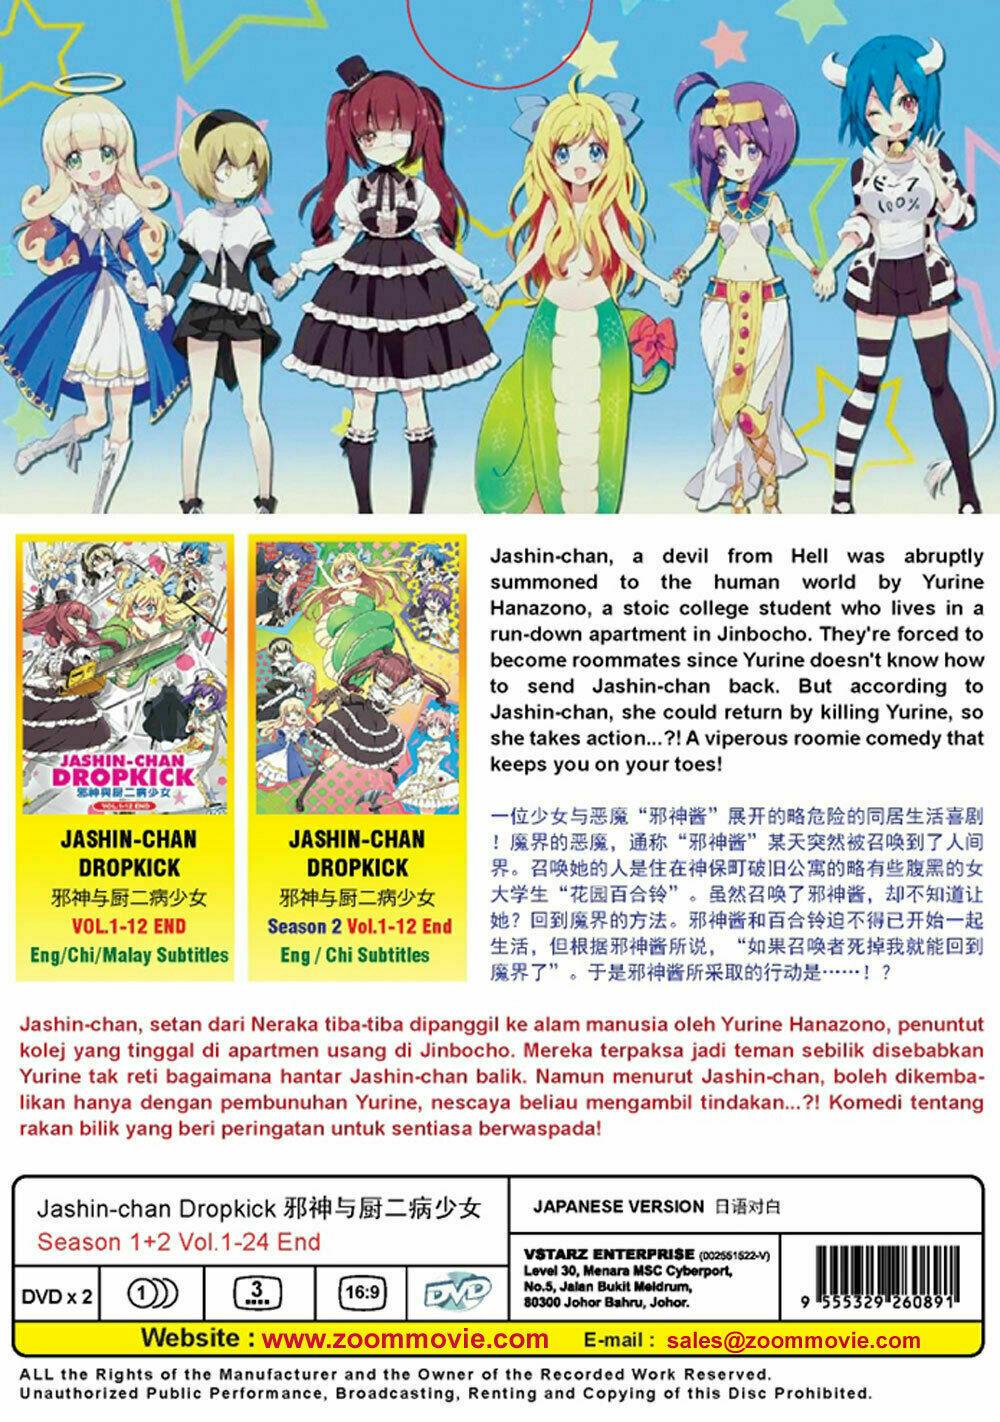 Jashin-chan Dropkick Season 1+ 2 DVD Vol. 1-24 End with Eng. Sub Ship From USA